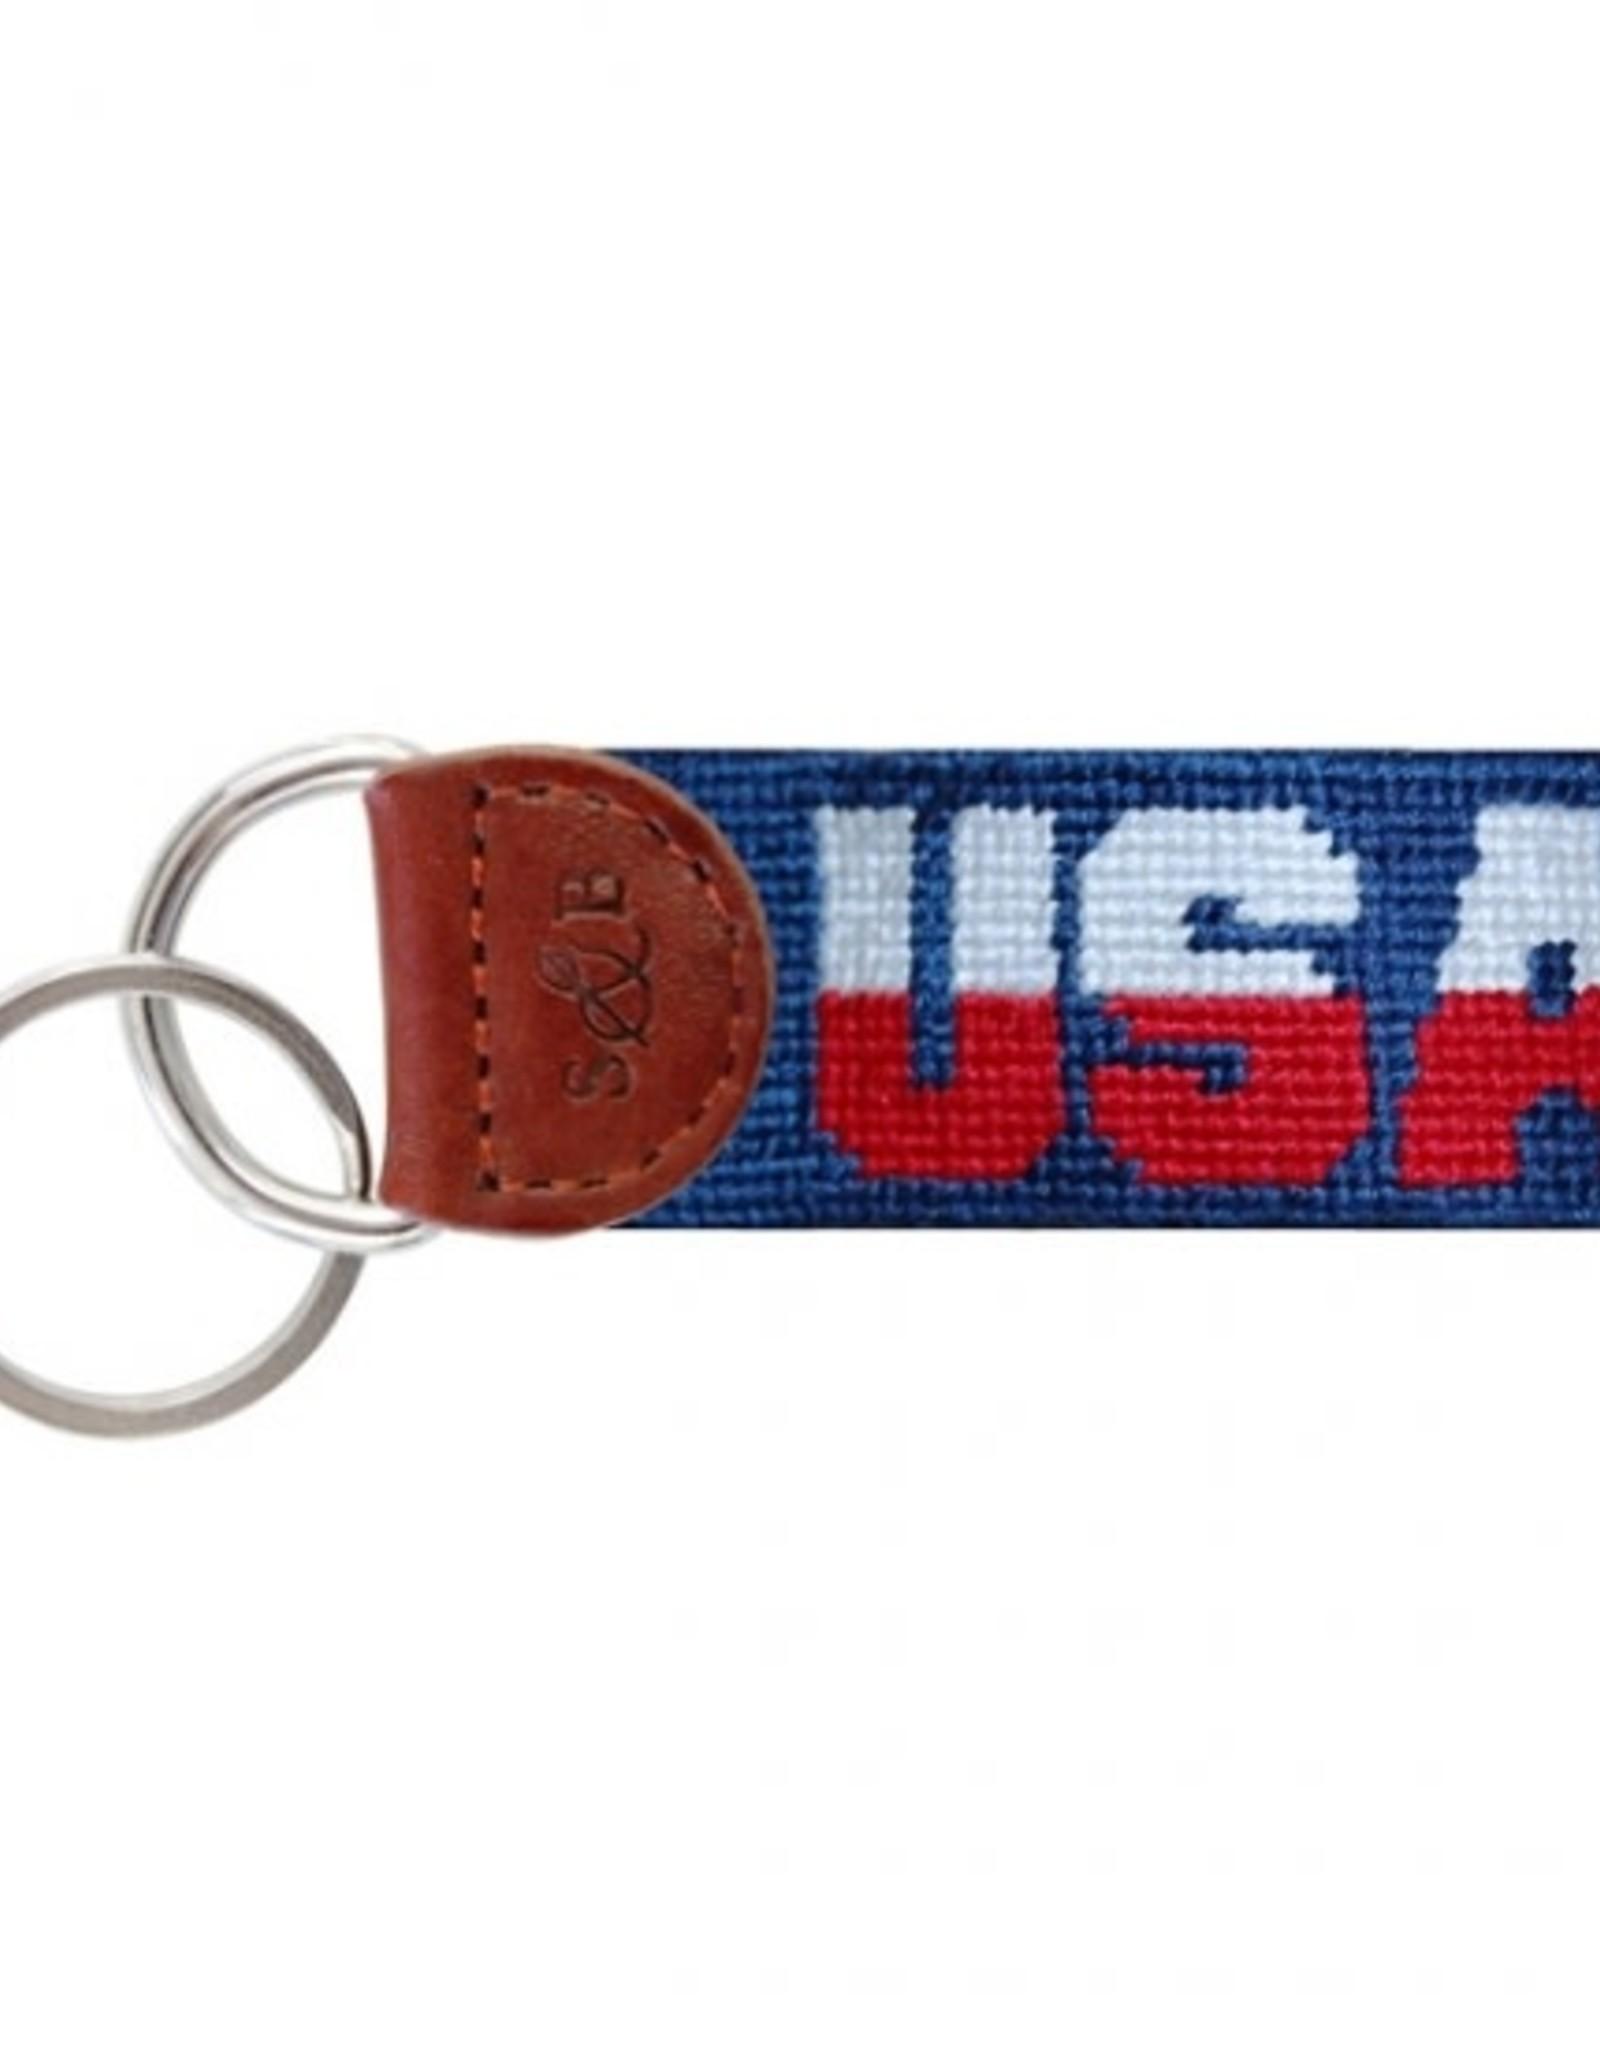 Smathers & Branson USA Needlepoint Key Fob